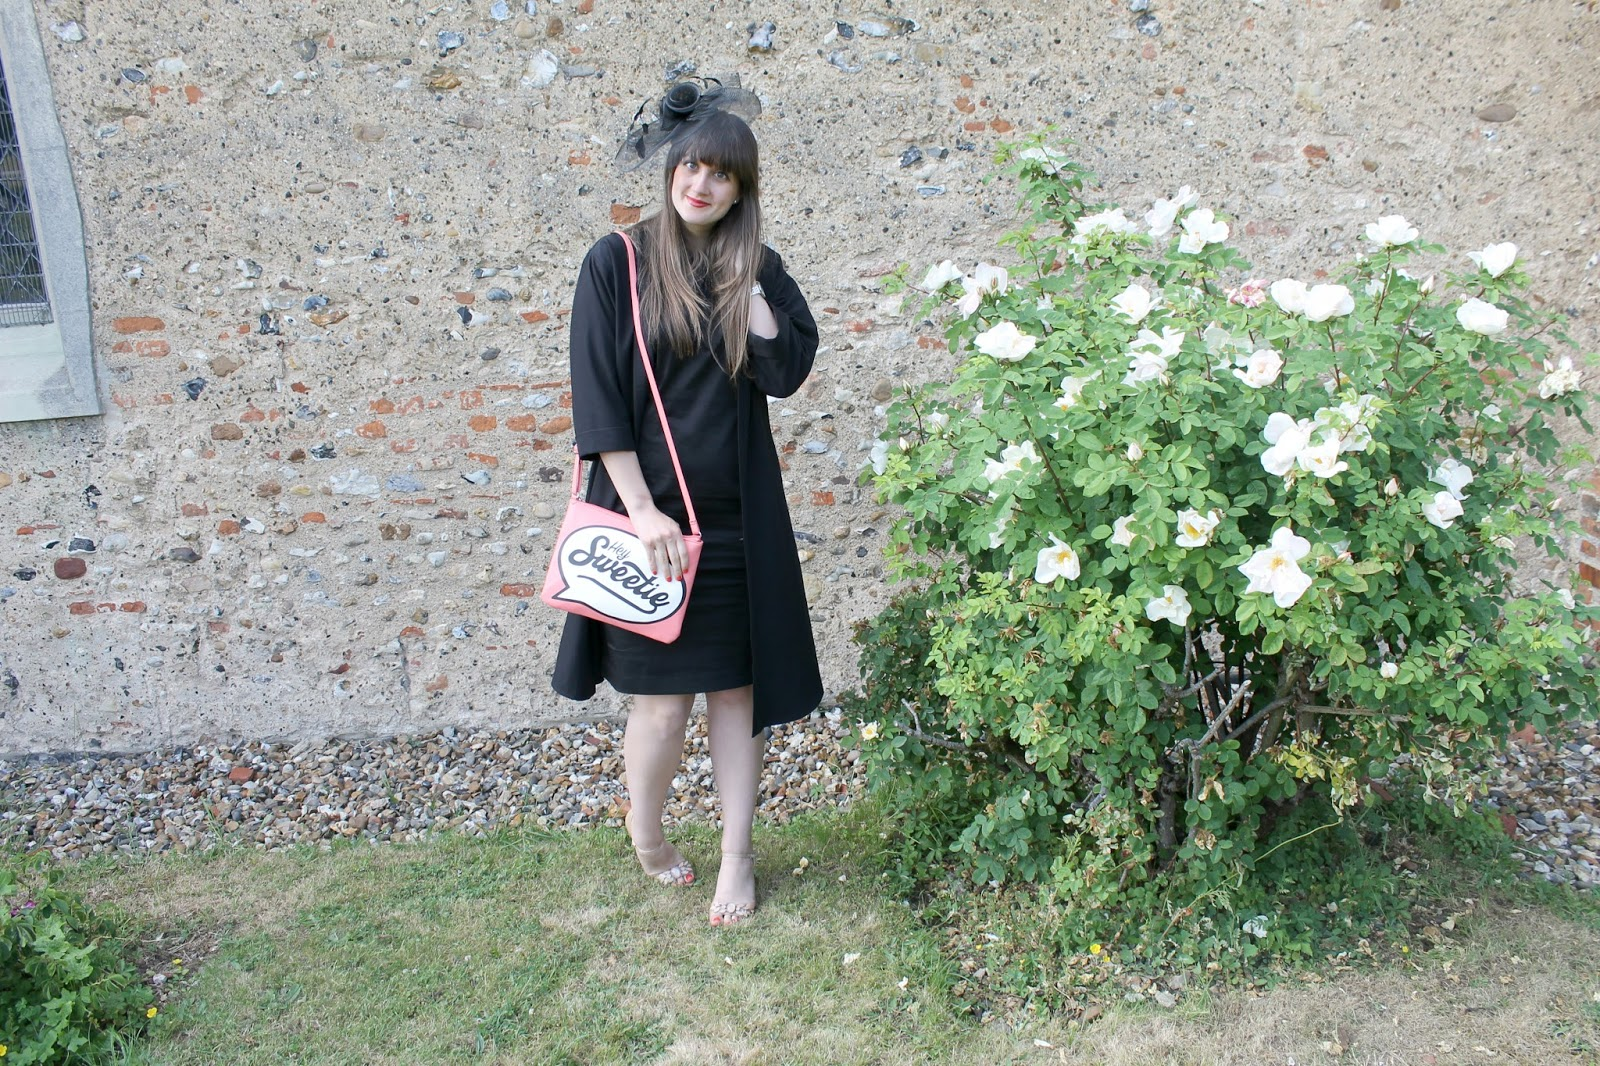 Black sandals asda - Black Duster Coat Topshop Similar Nude Embellished Block Heeled Sandals C O George At Asda Slogan Print Cross Body Bag C O